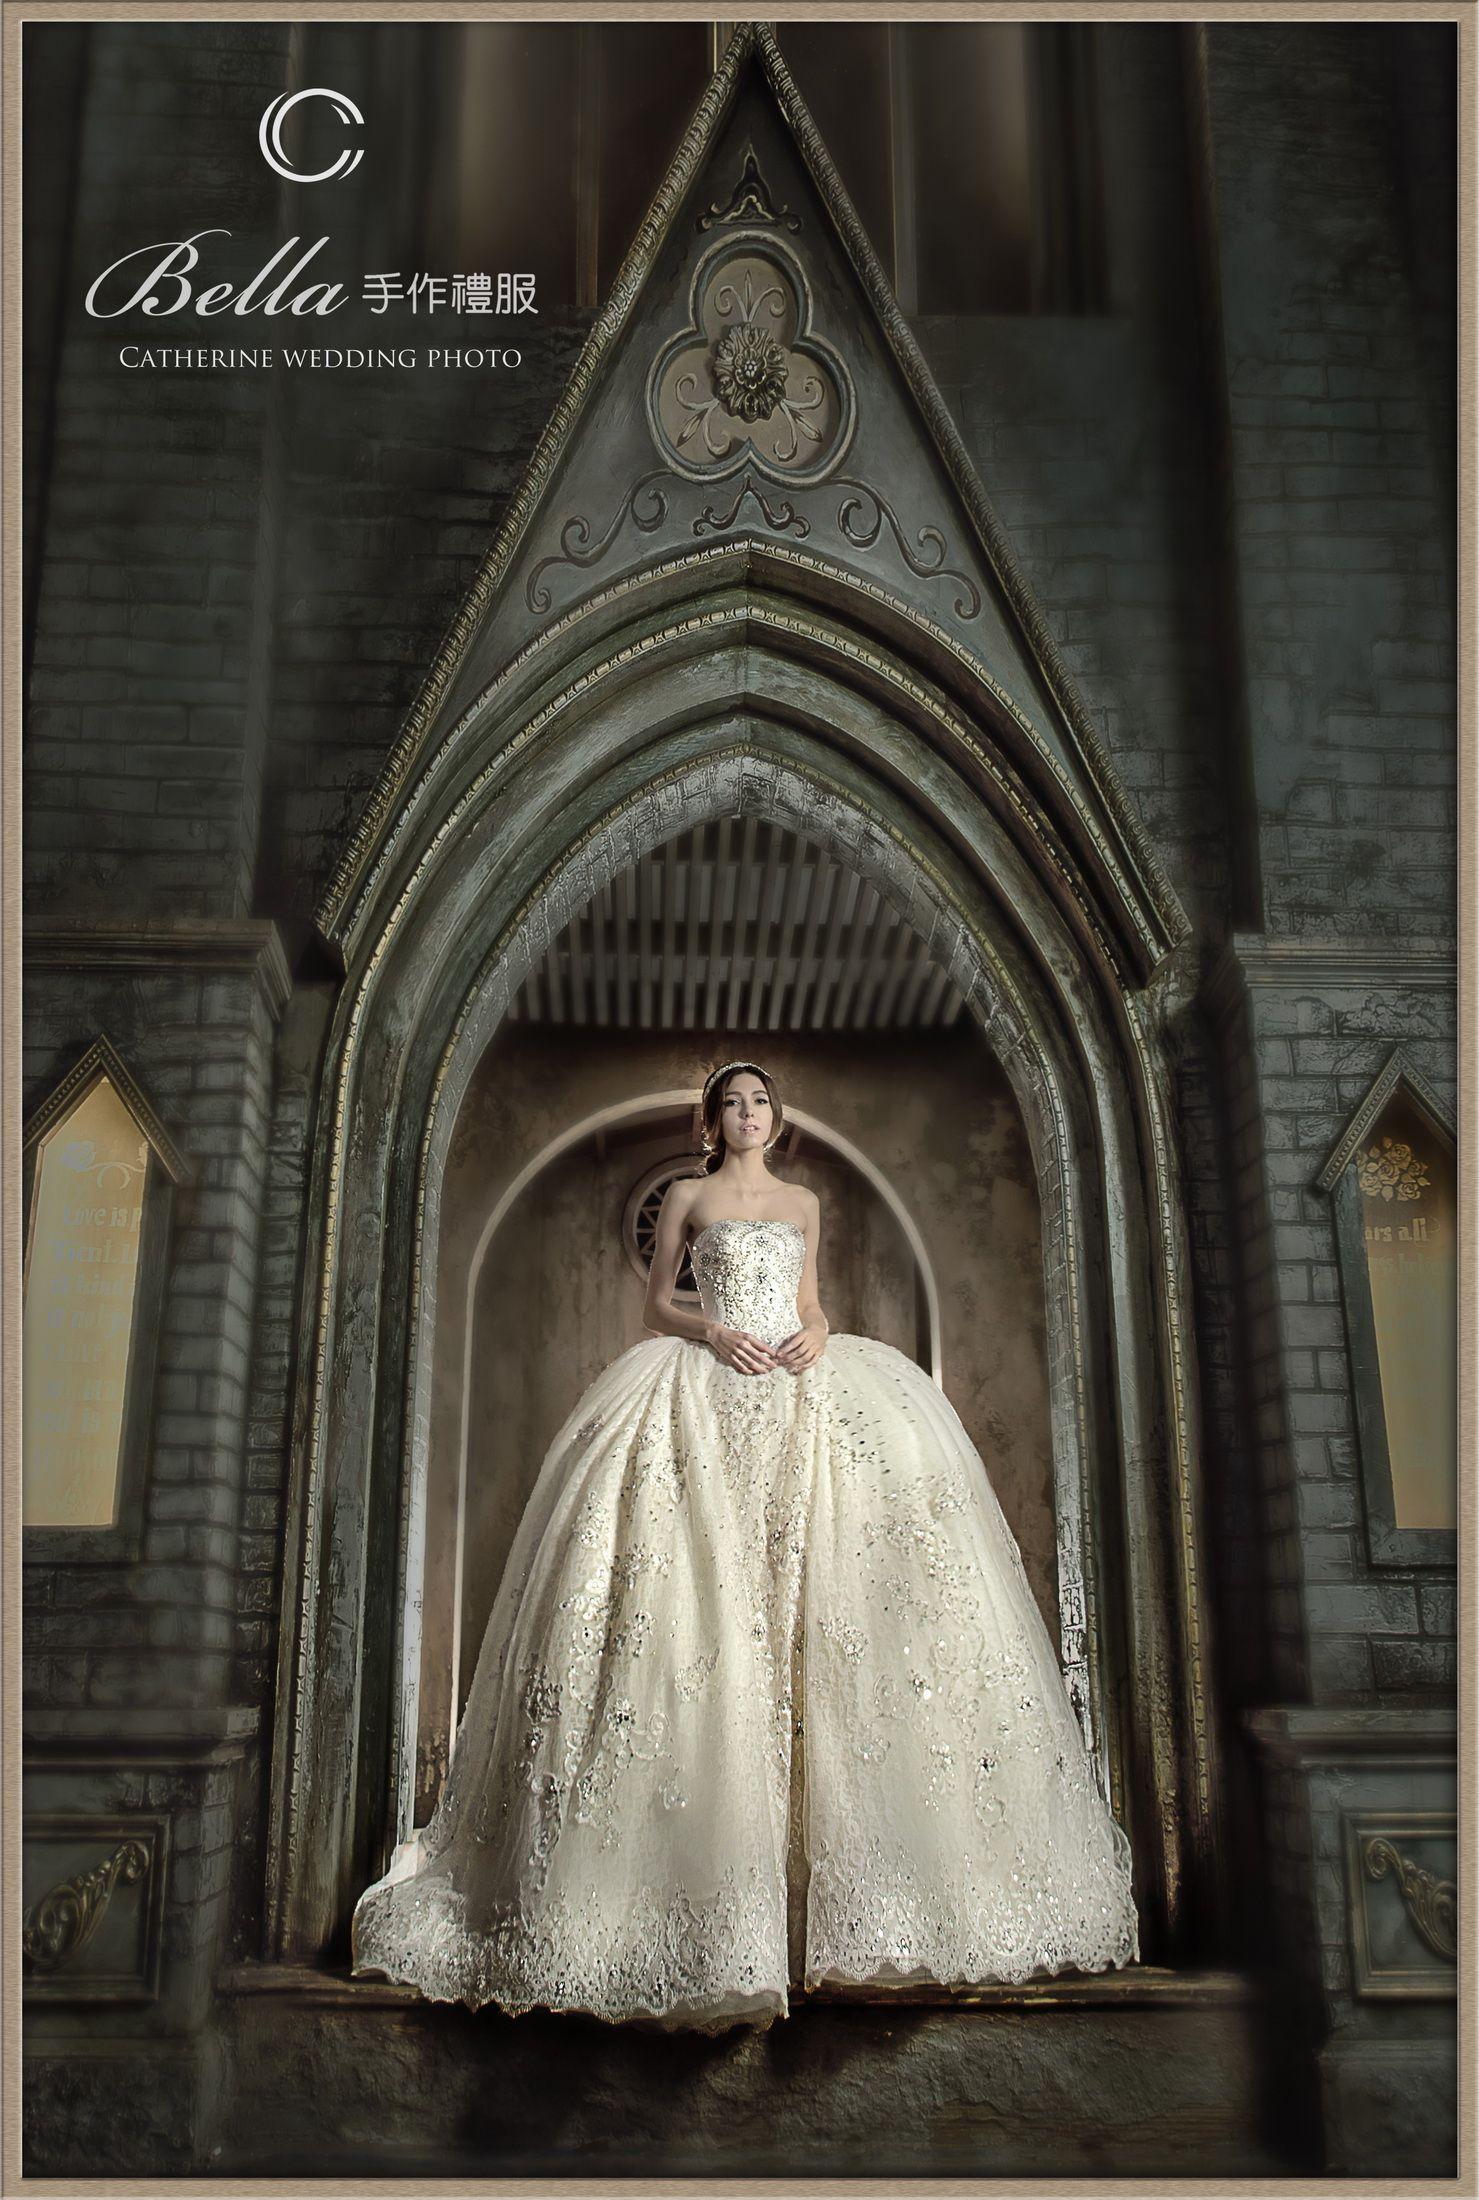 Catherine Wedding (With images) Bella wedding dress